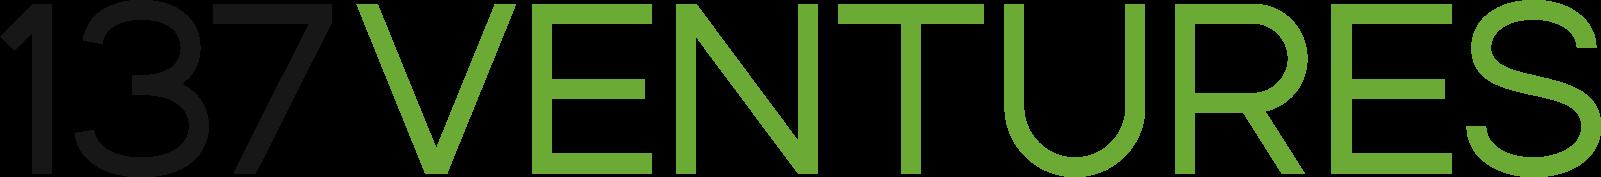 137 (Angel) logo